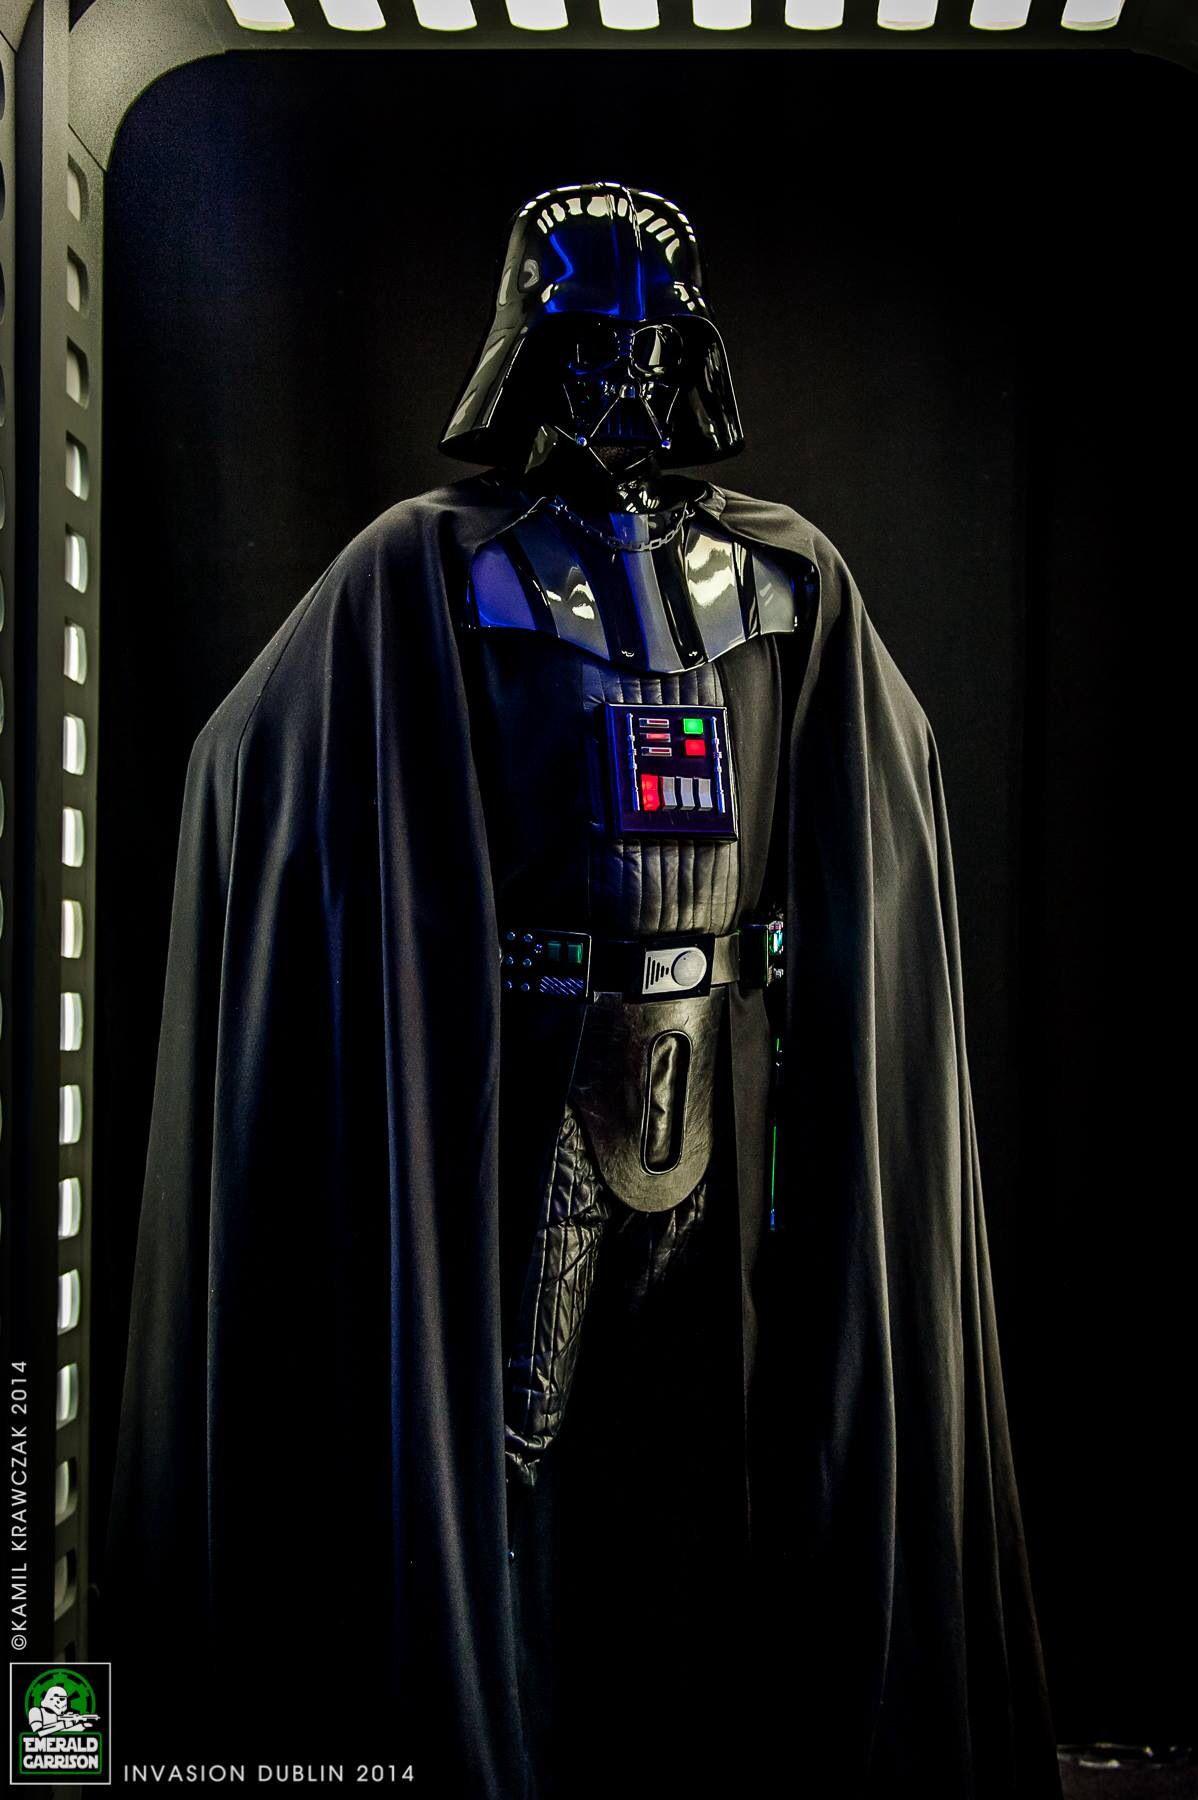 Revenge Of The Sith Darth Vader Costume Worn By Julian Checkley Darth Vader Costumes Darth Vader Dark Lord